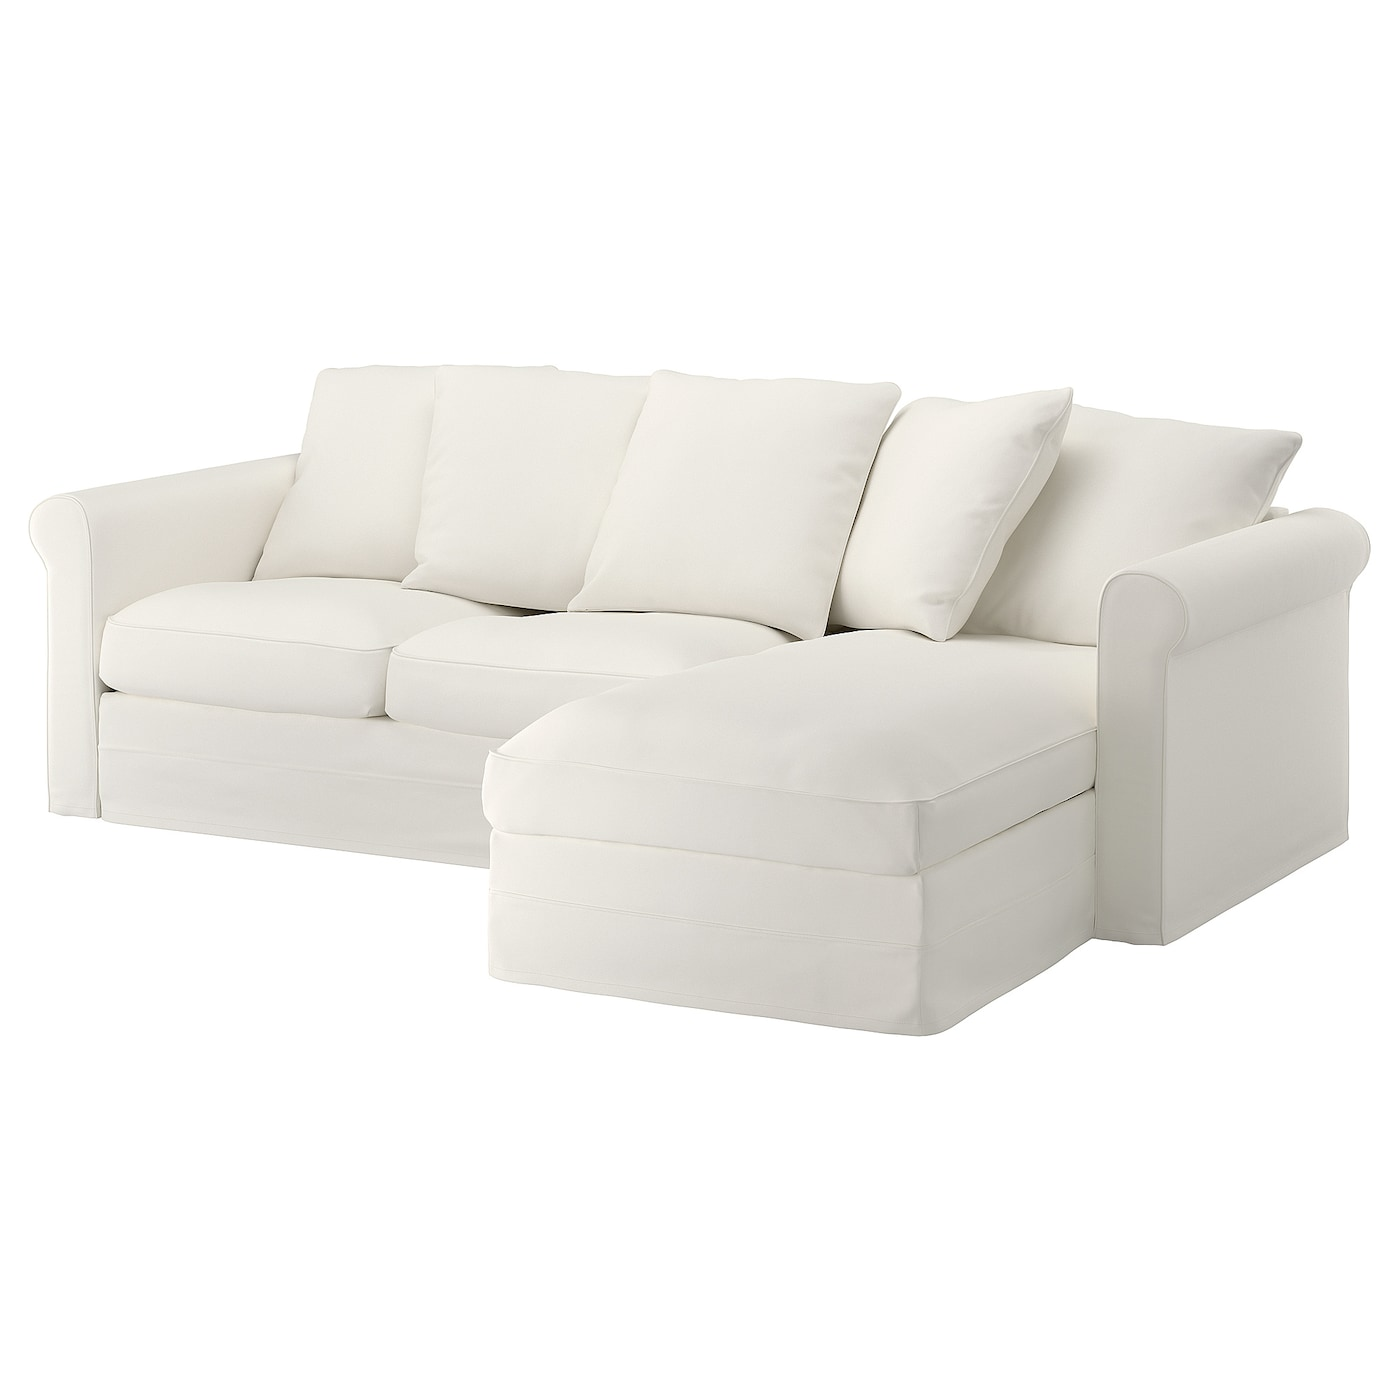 cubre sofa chaise longue ikea